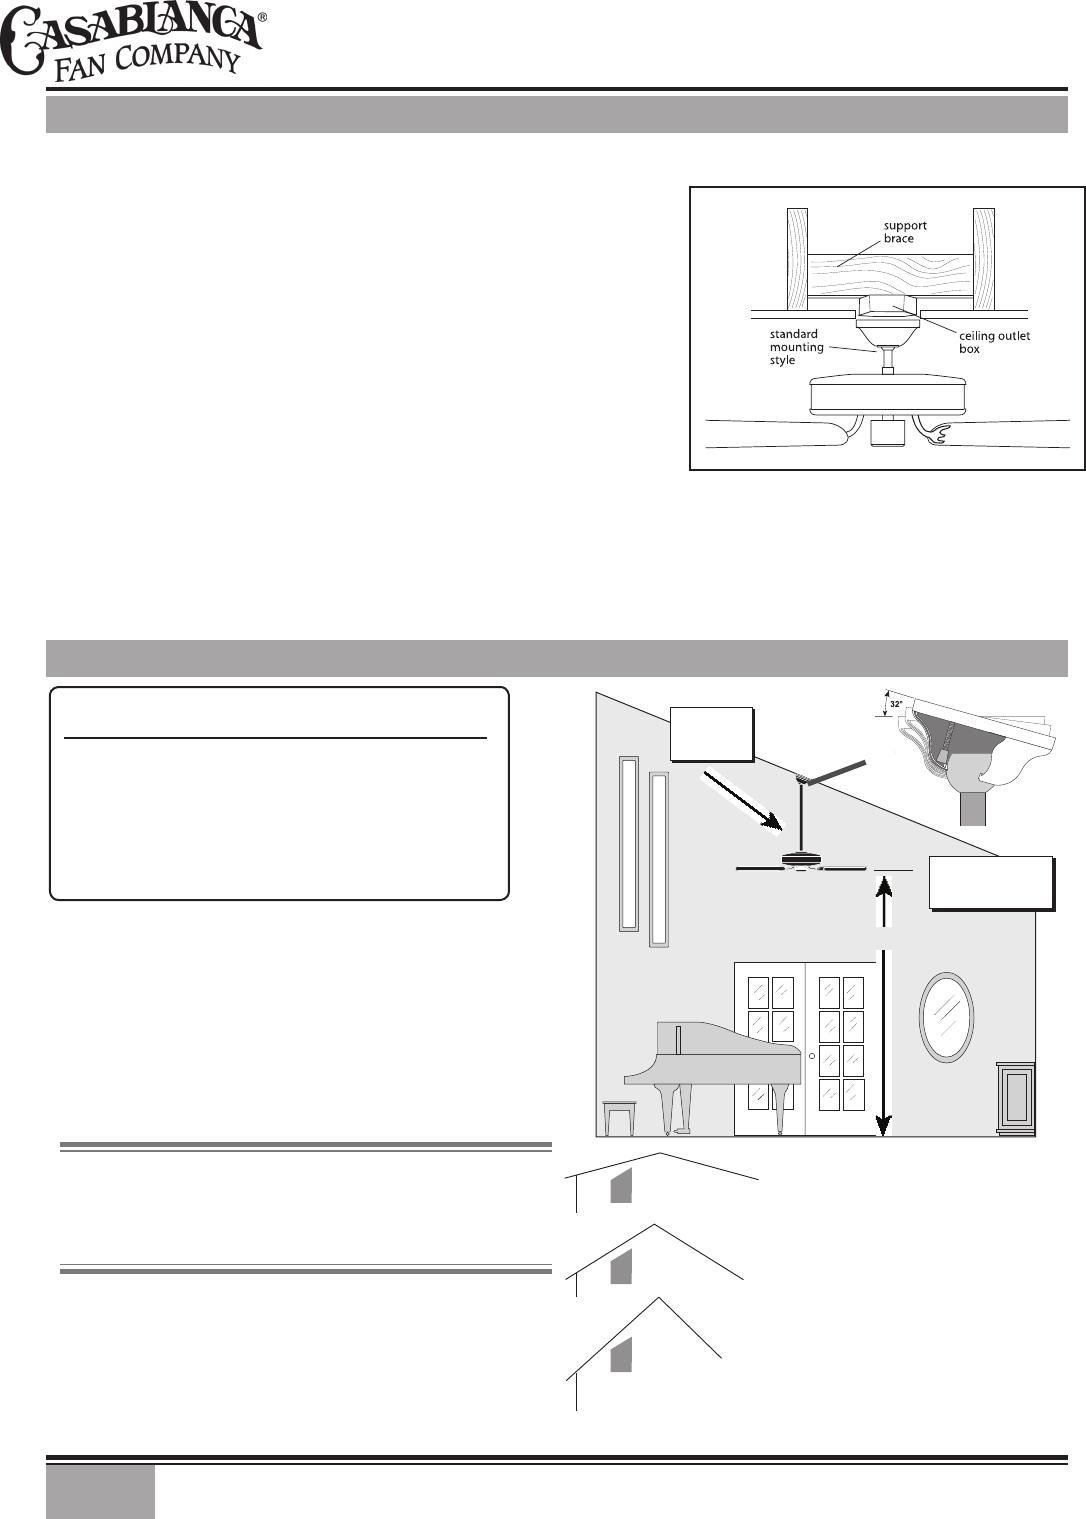 Casablanca Fan Company C15g624l Users Manual Fans Wiring Diagram W 11 6